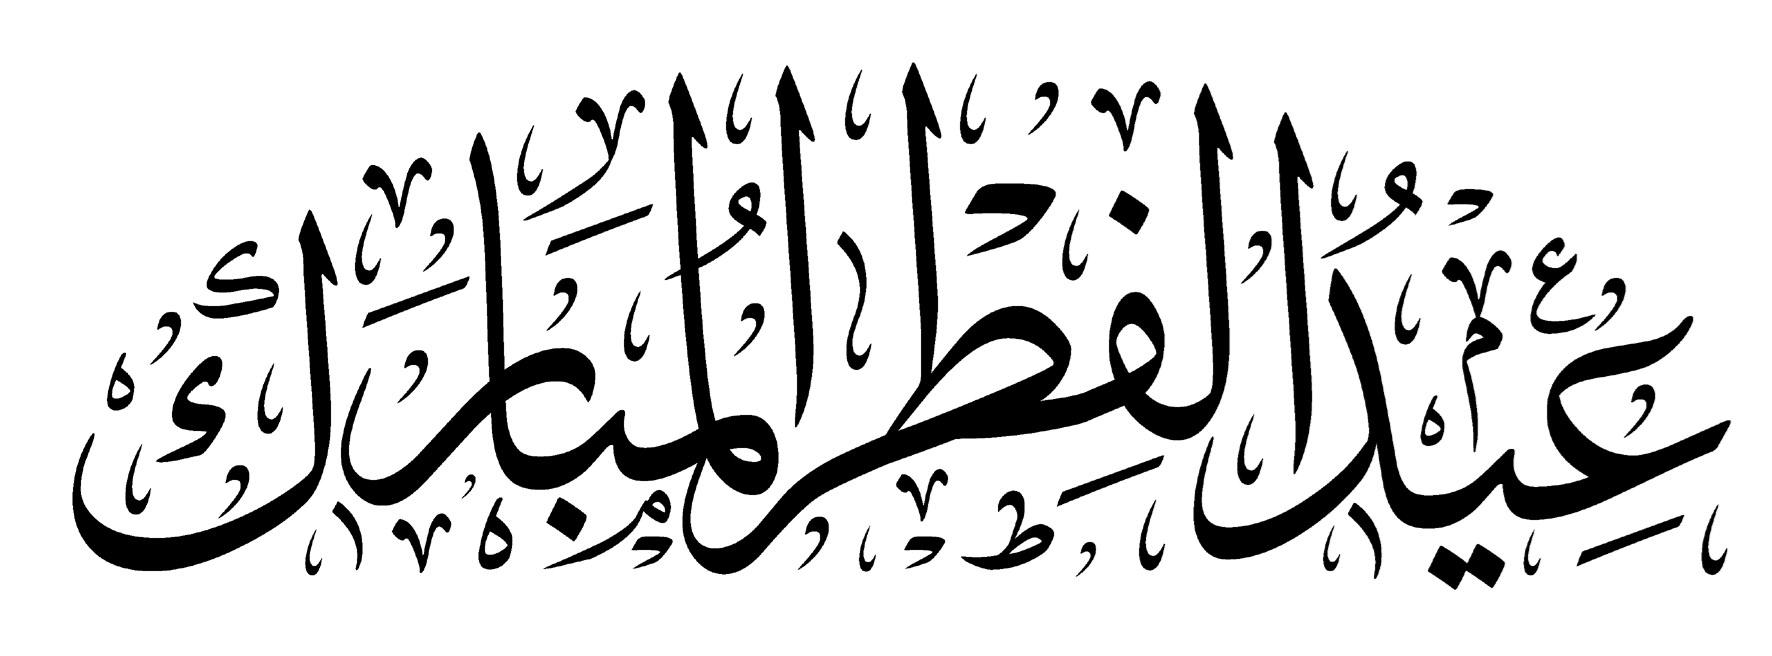 Eid Ul Fitr - Eid Ul Fitr.png